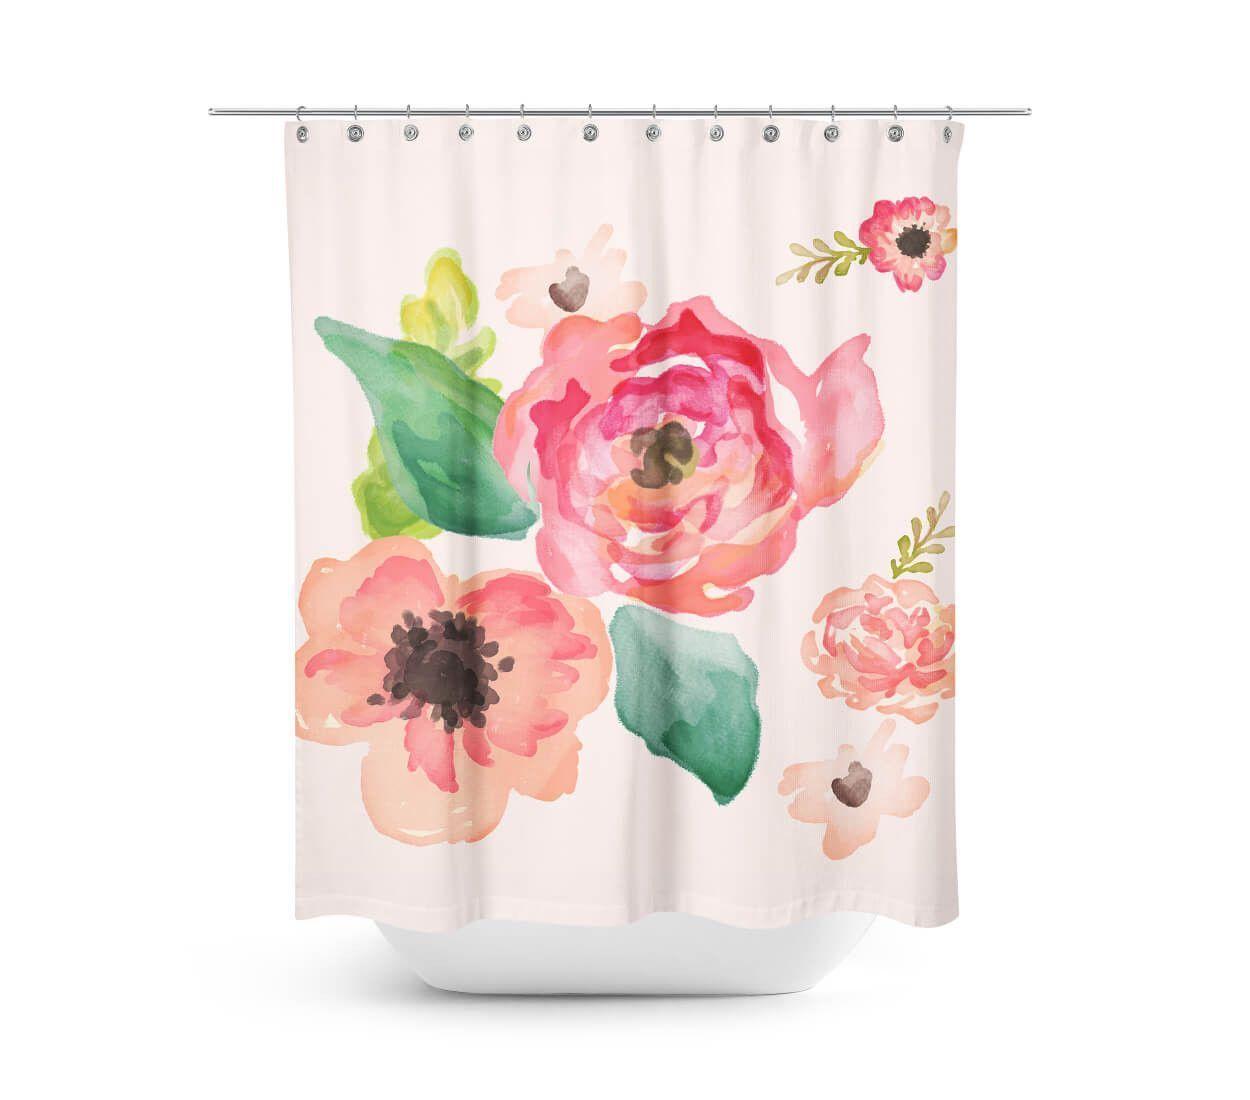 Floral Dreams Shower Curtain Floral Shower Curtains Dream Shower Unique Shower Curtain